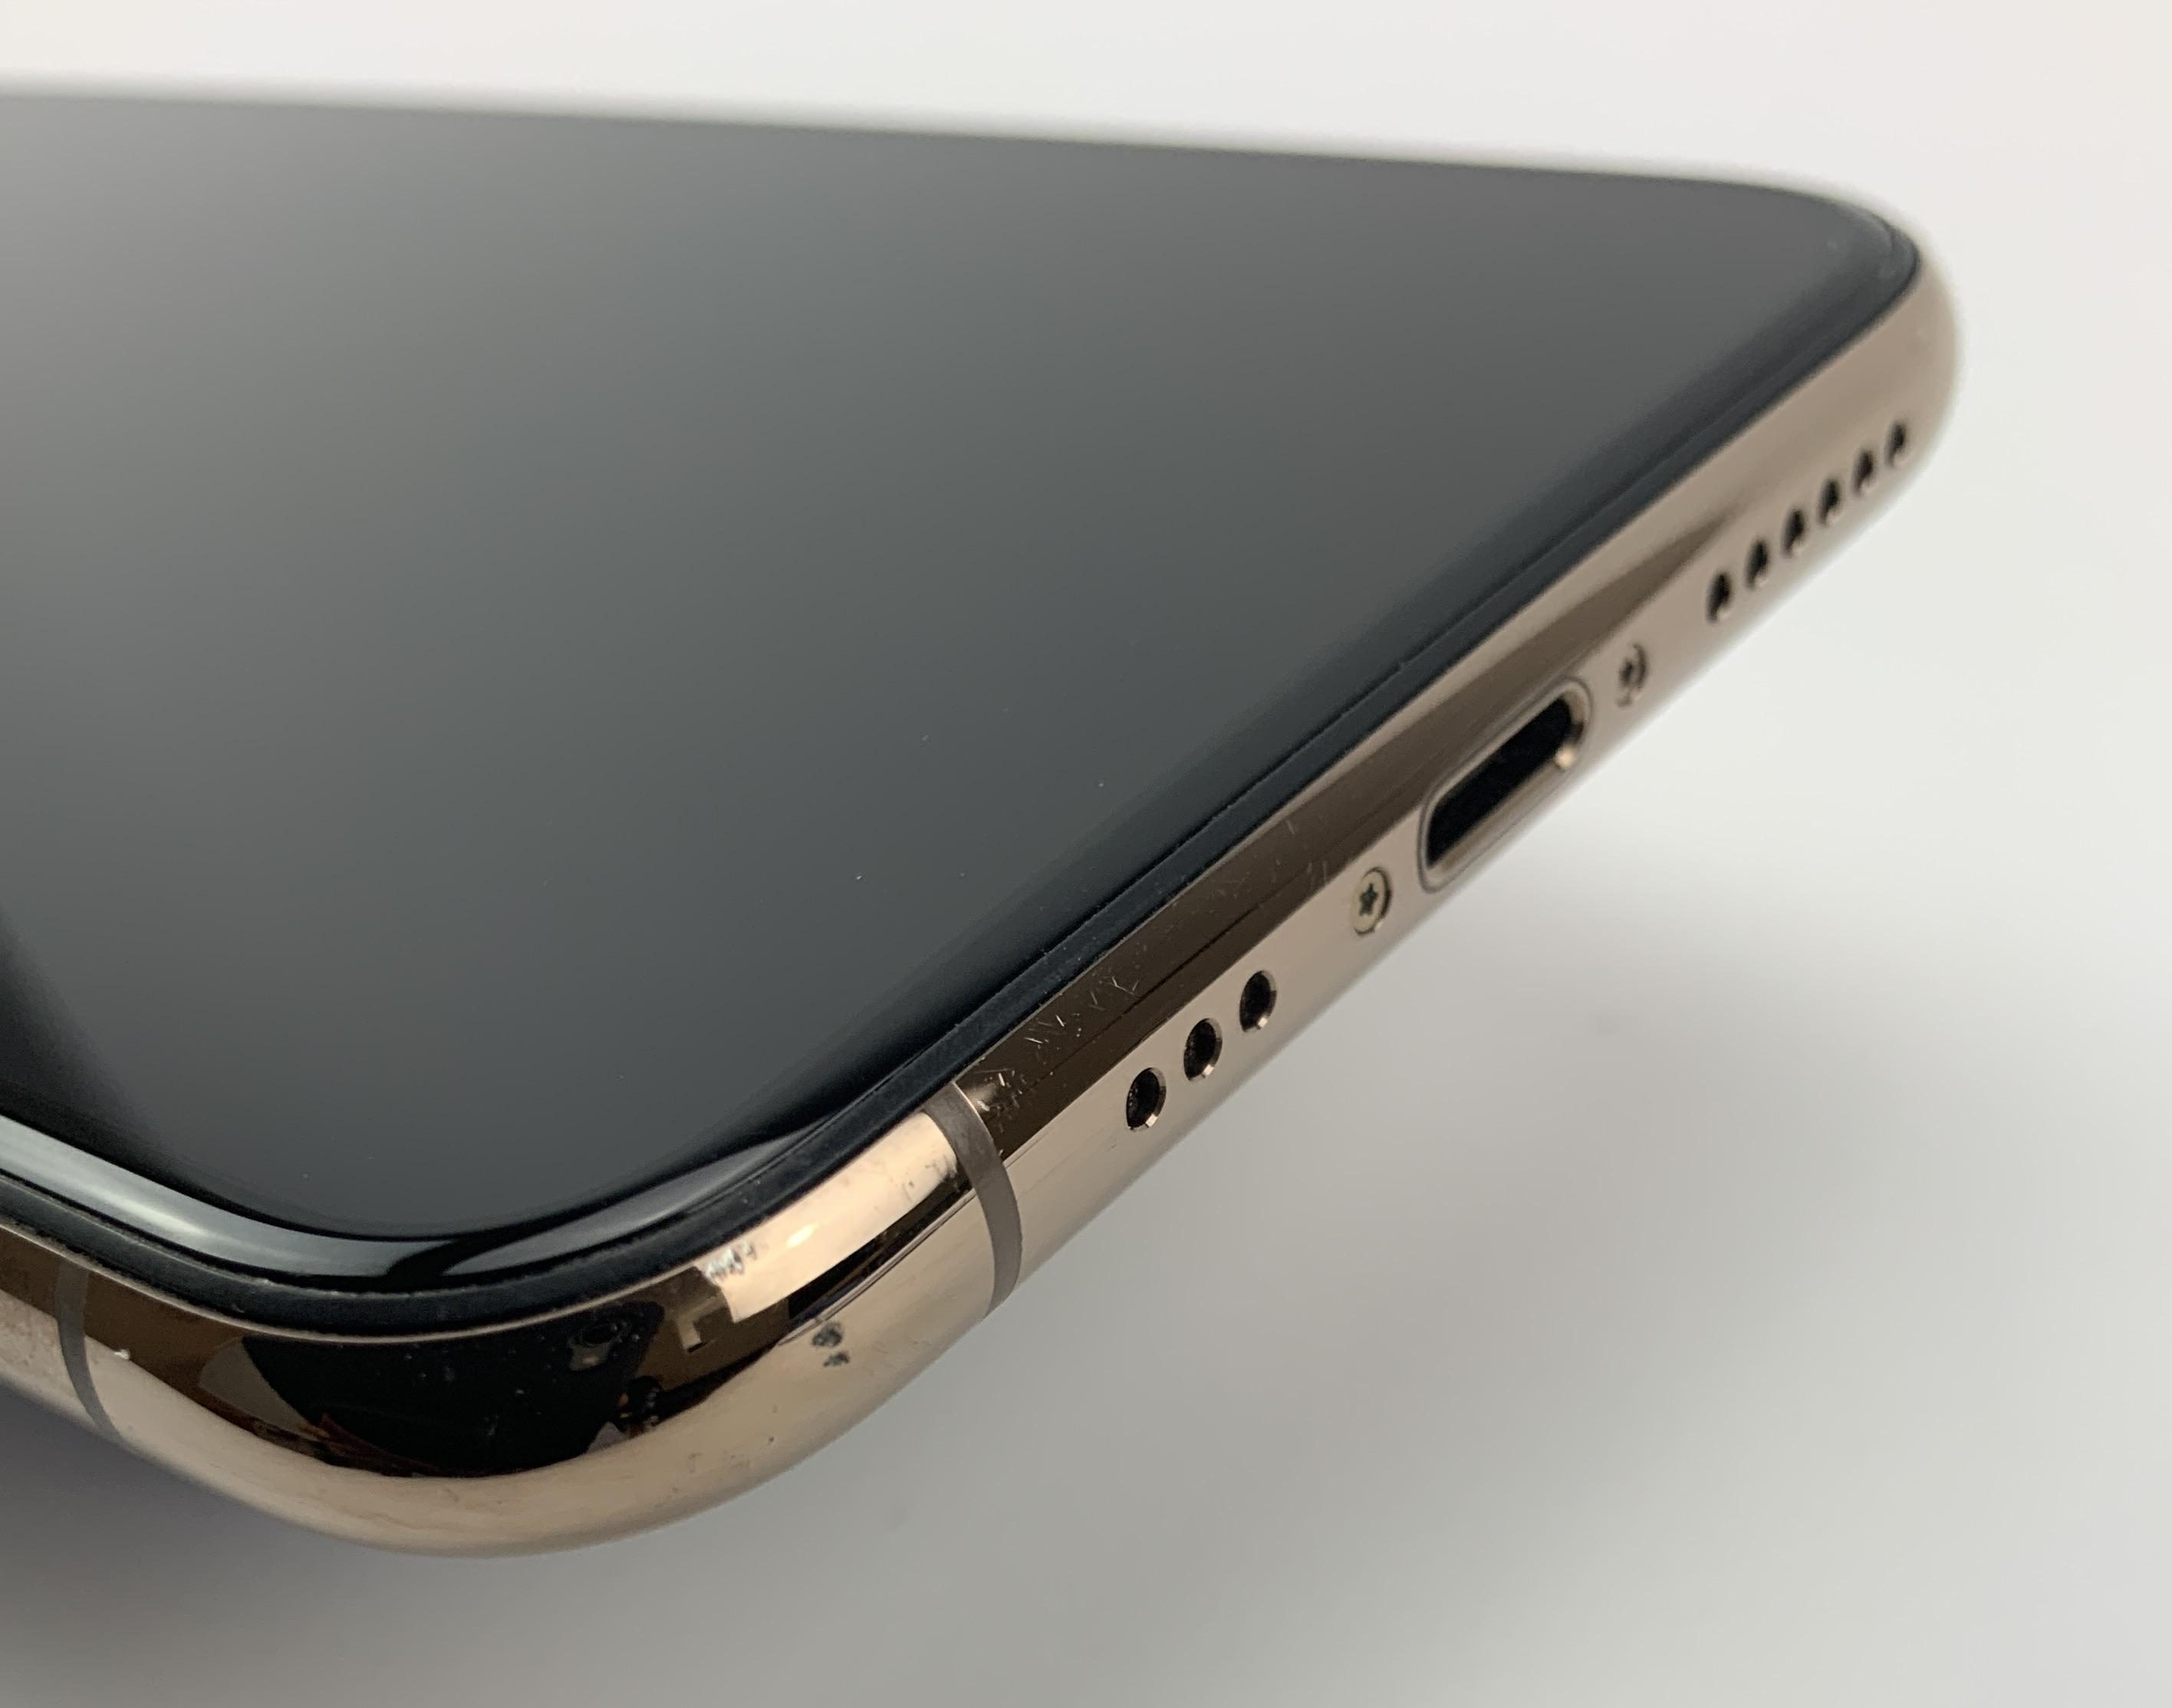 iPhone 11 Pro 64GB, 64GB, Gold, bild 4